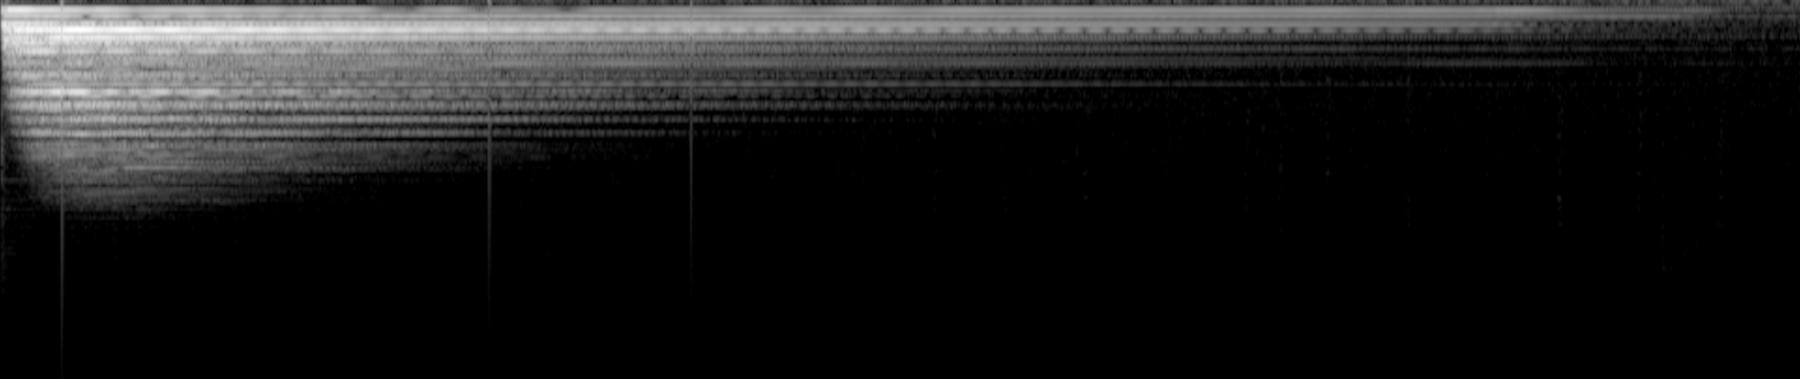 FAT2019 Preprocessed Mel-spectrogram Dataset | Kaggle